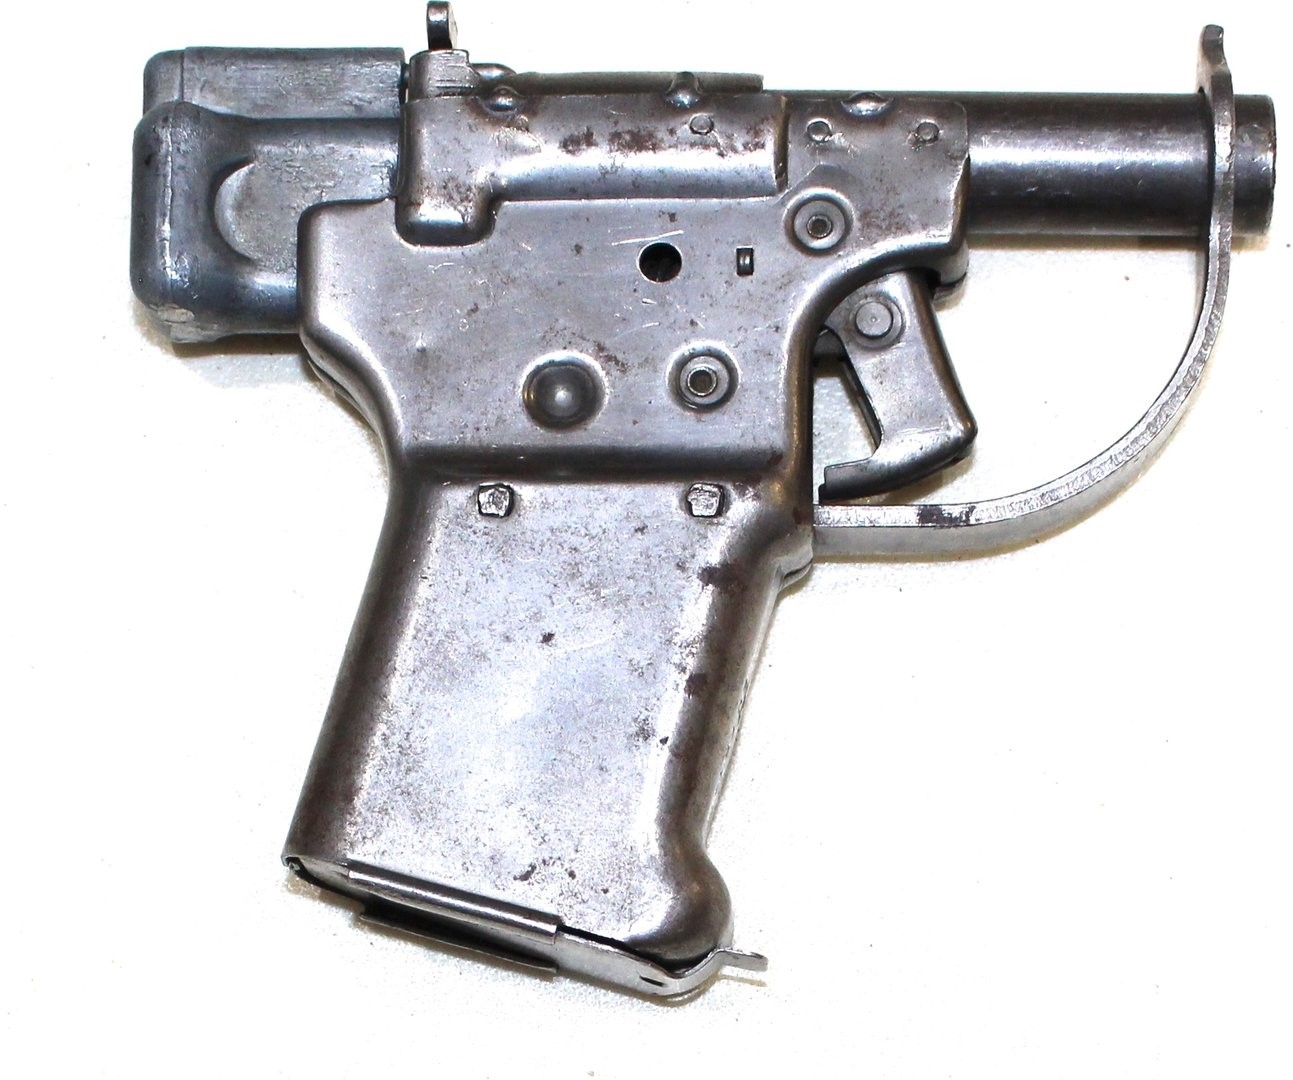 FP45 Liberator